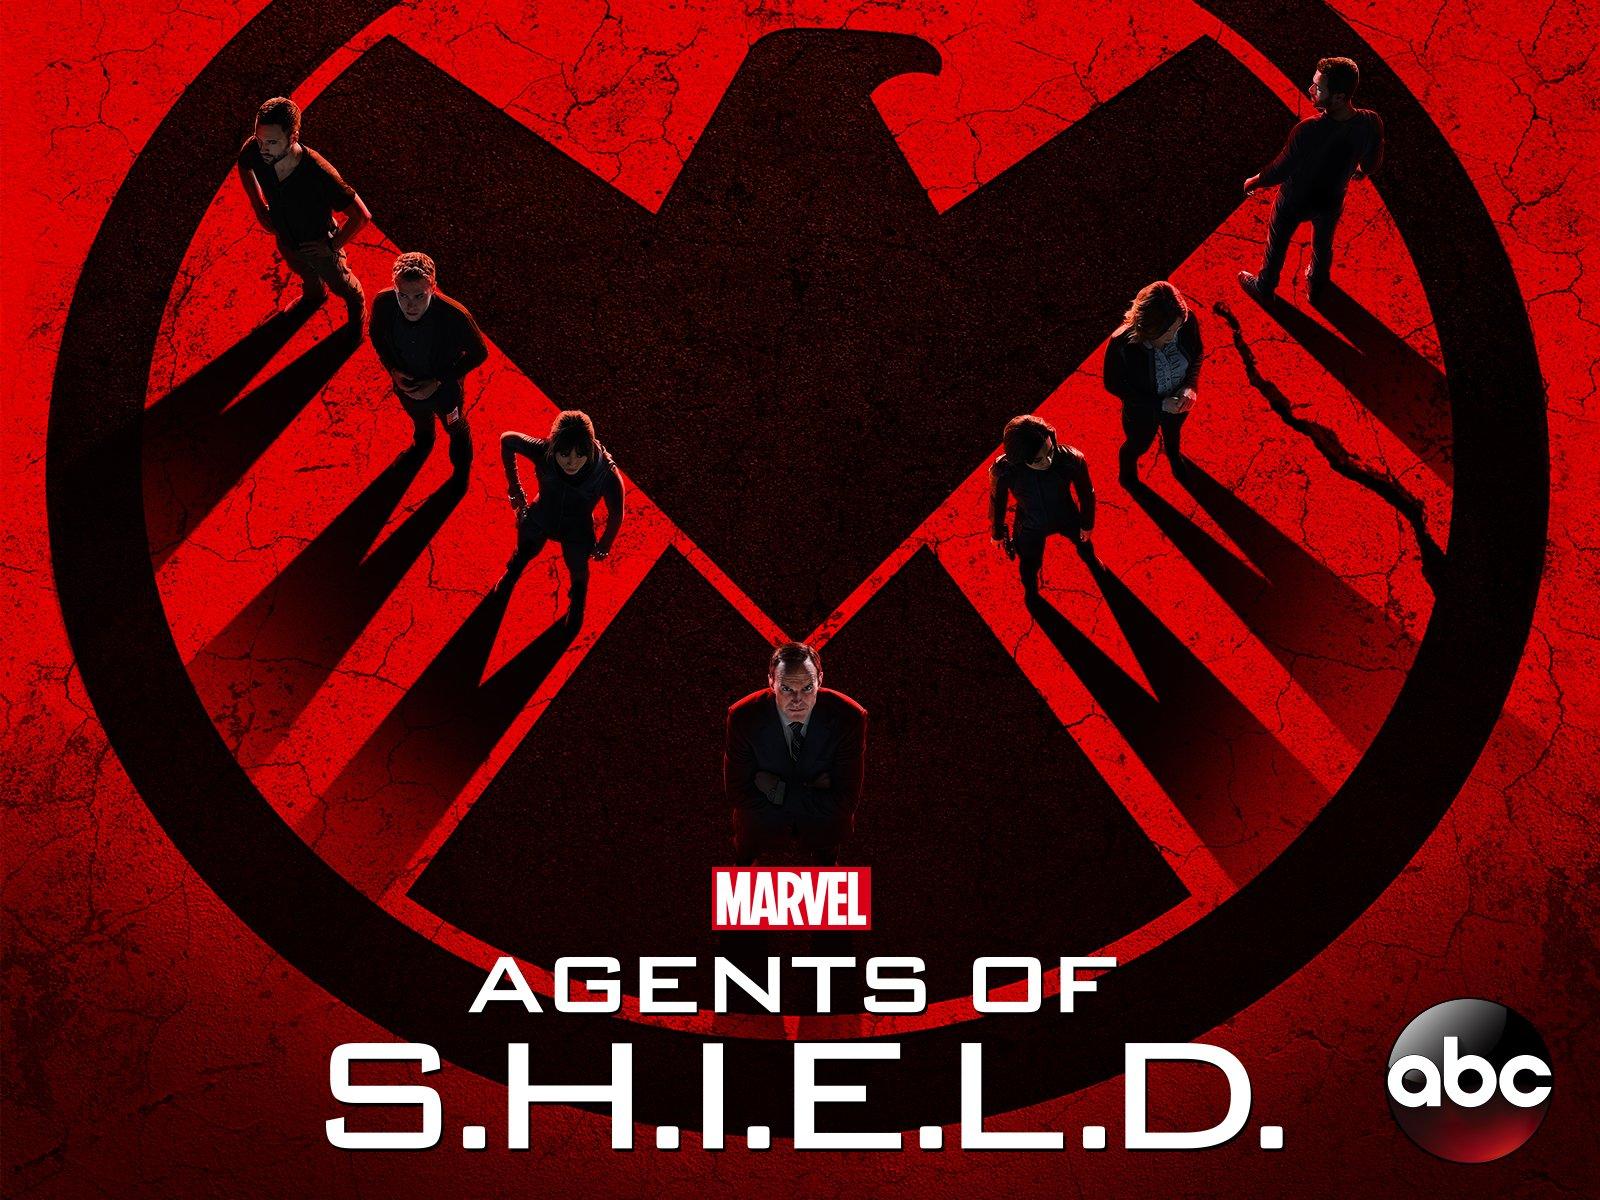 Amazon Marvels Agents Of SHIELD Season 2 Digital Services LLC